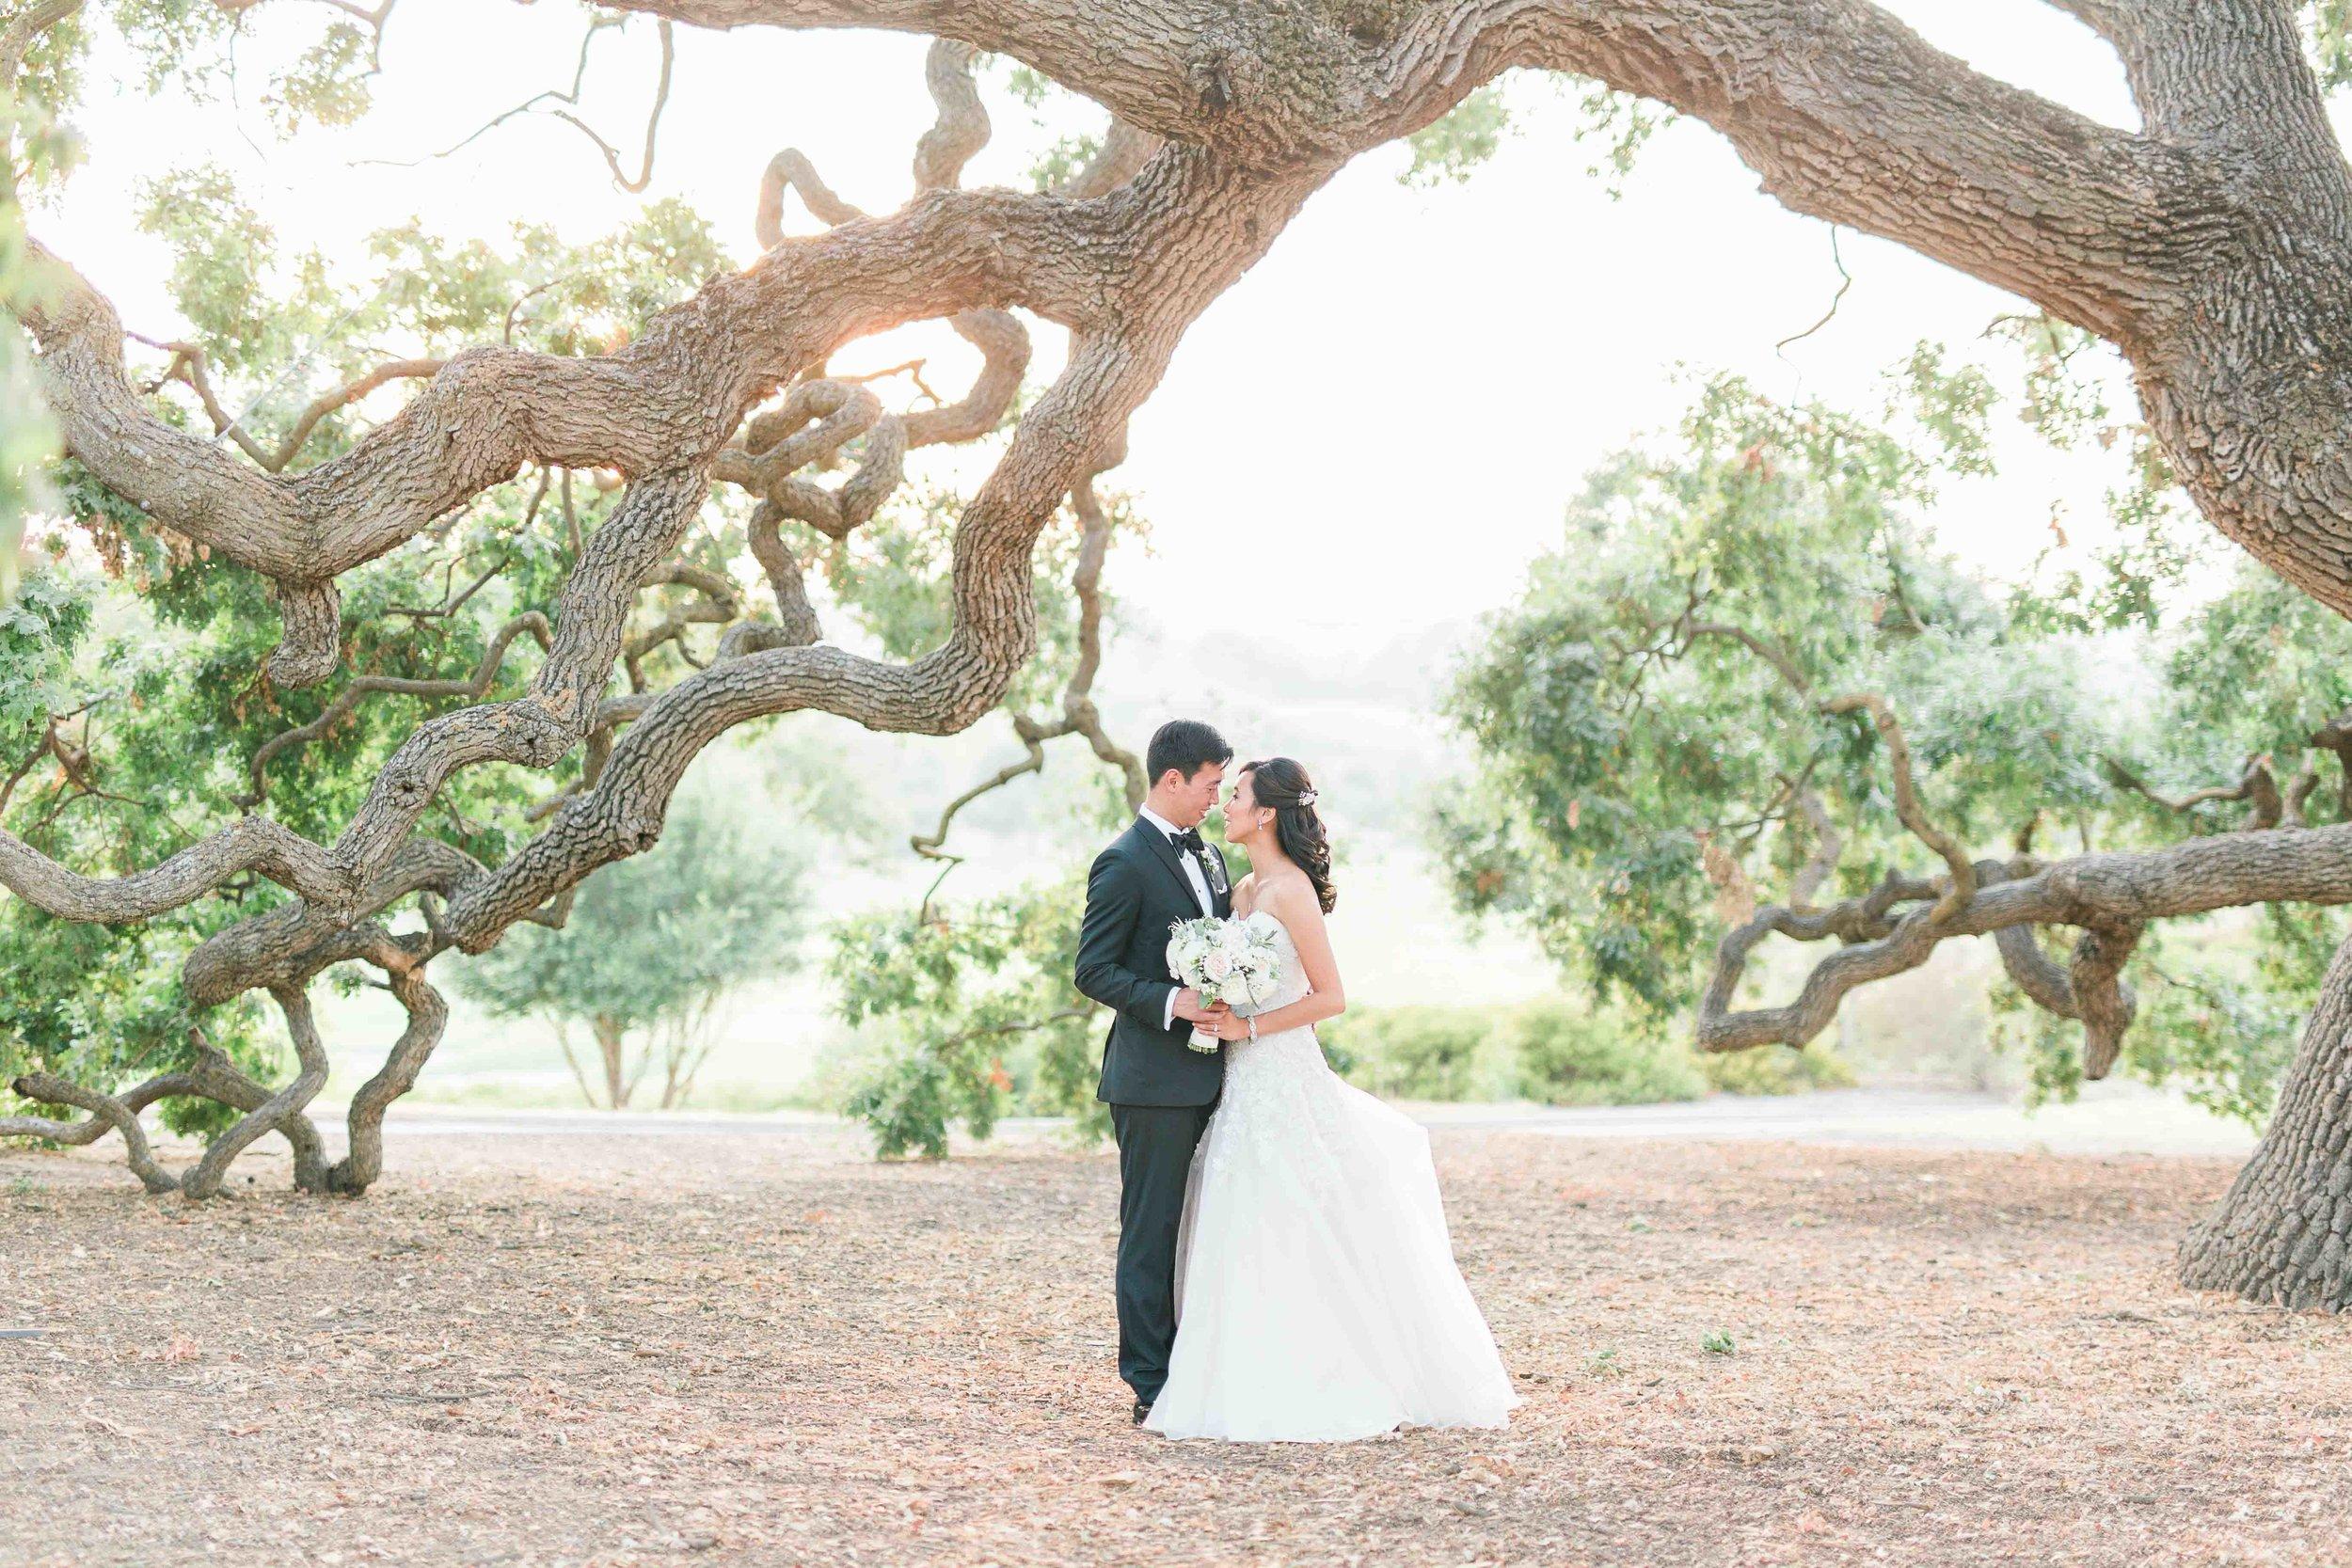 Ruby Hill Wedding Photos by JBJ Pictures - San Francisco Wedding Photographer - Pleasanton Wedding Venue (72).jpg